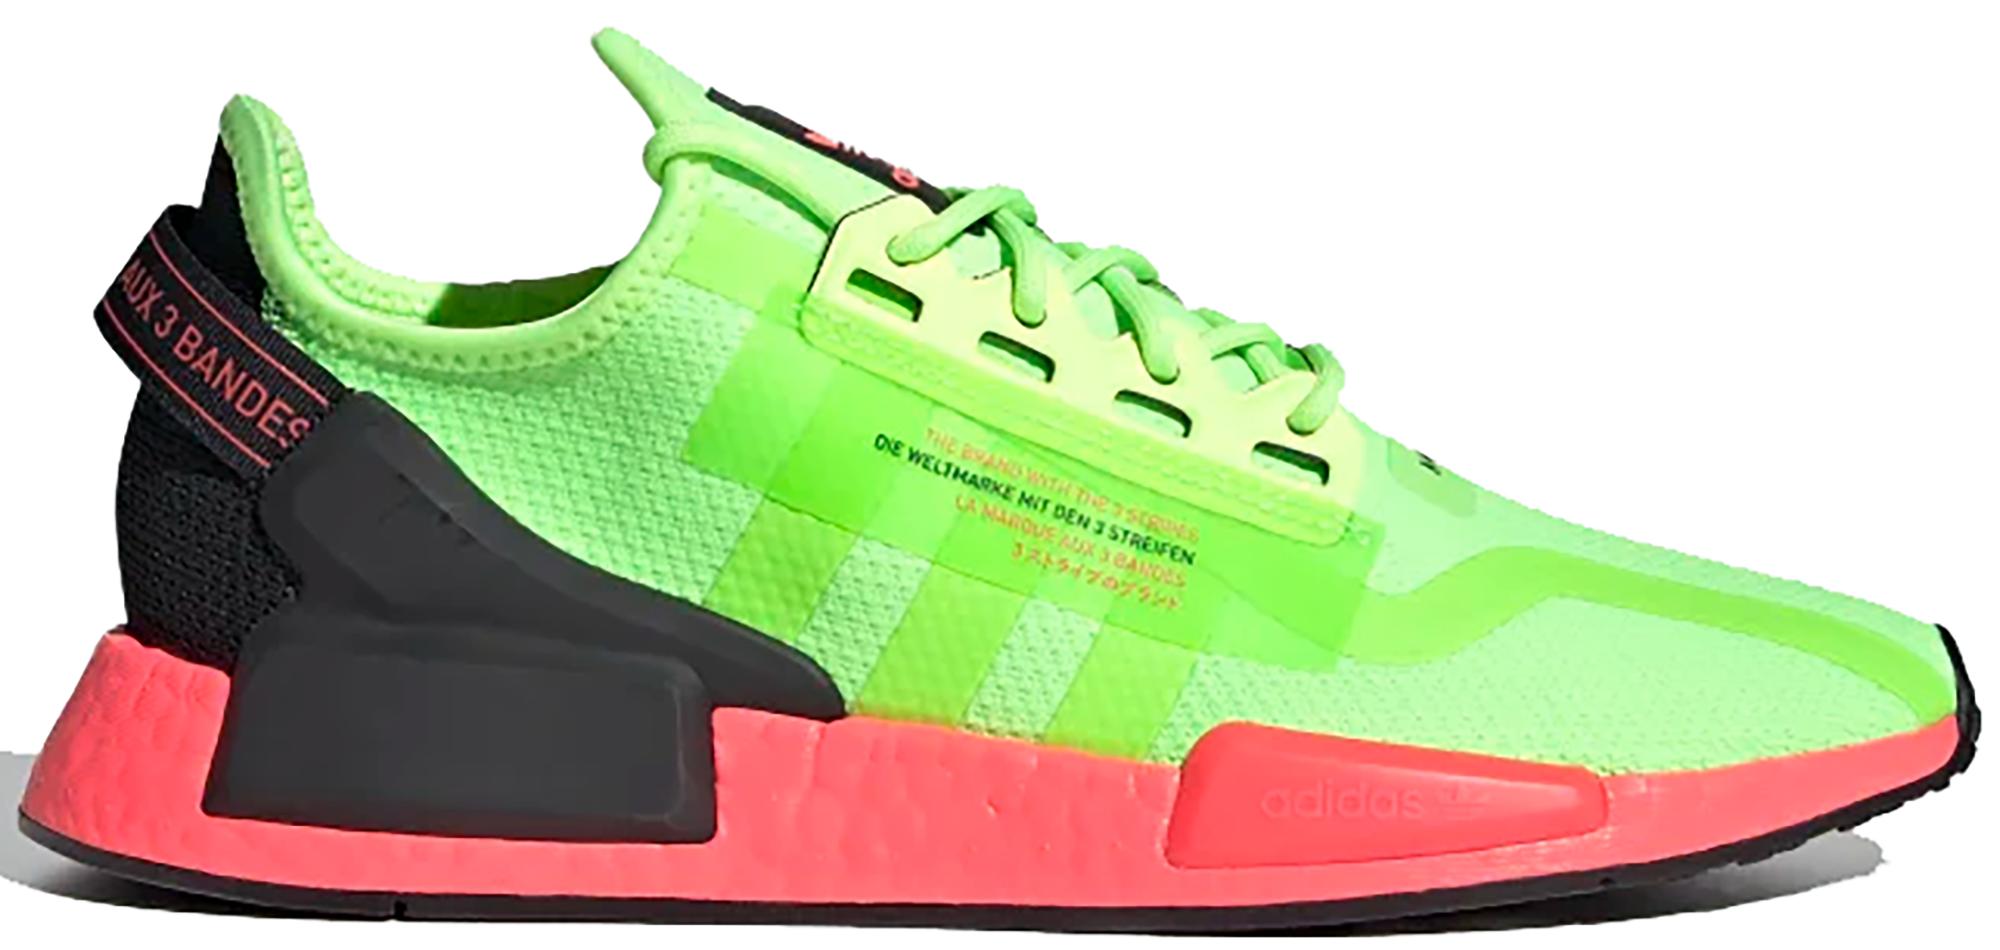 adidas NMD R1 V2 Watermelon Pack Green